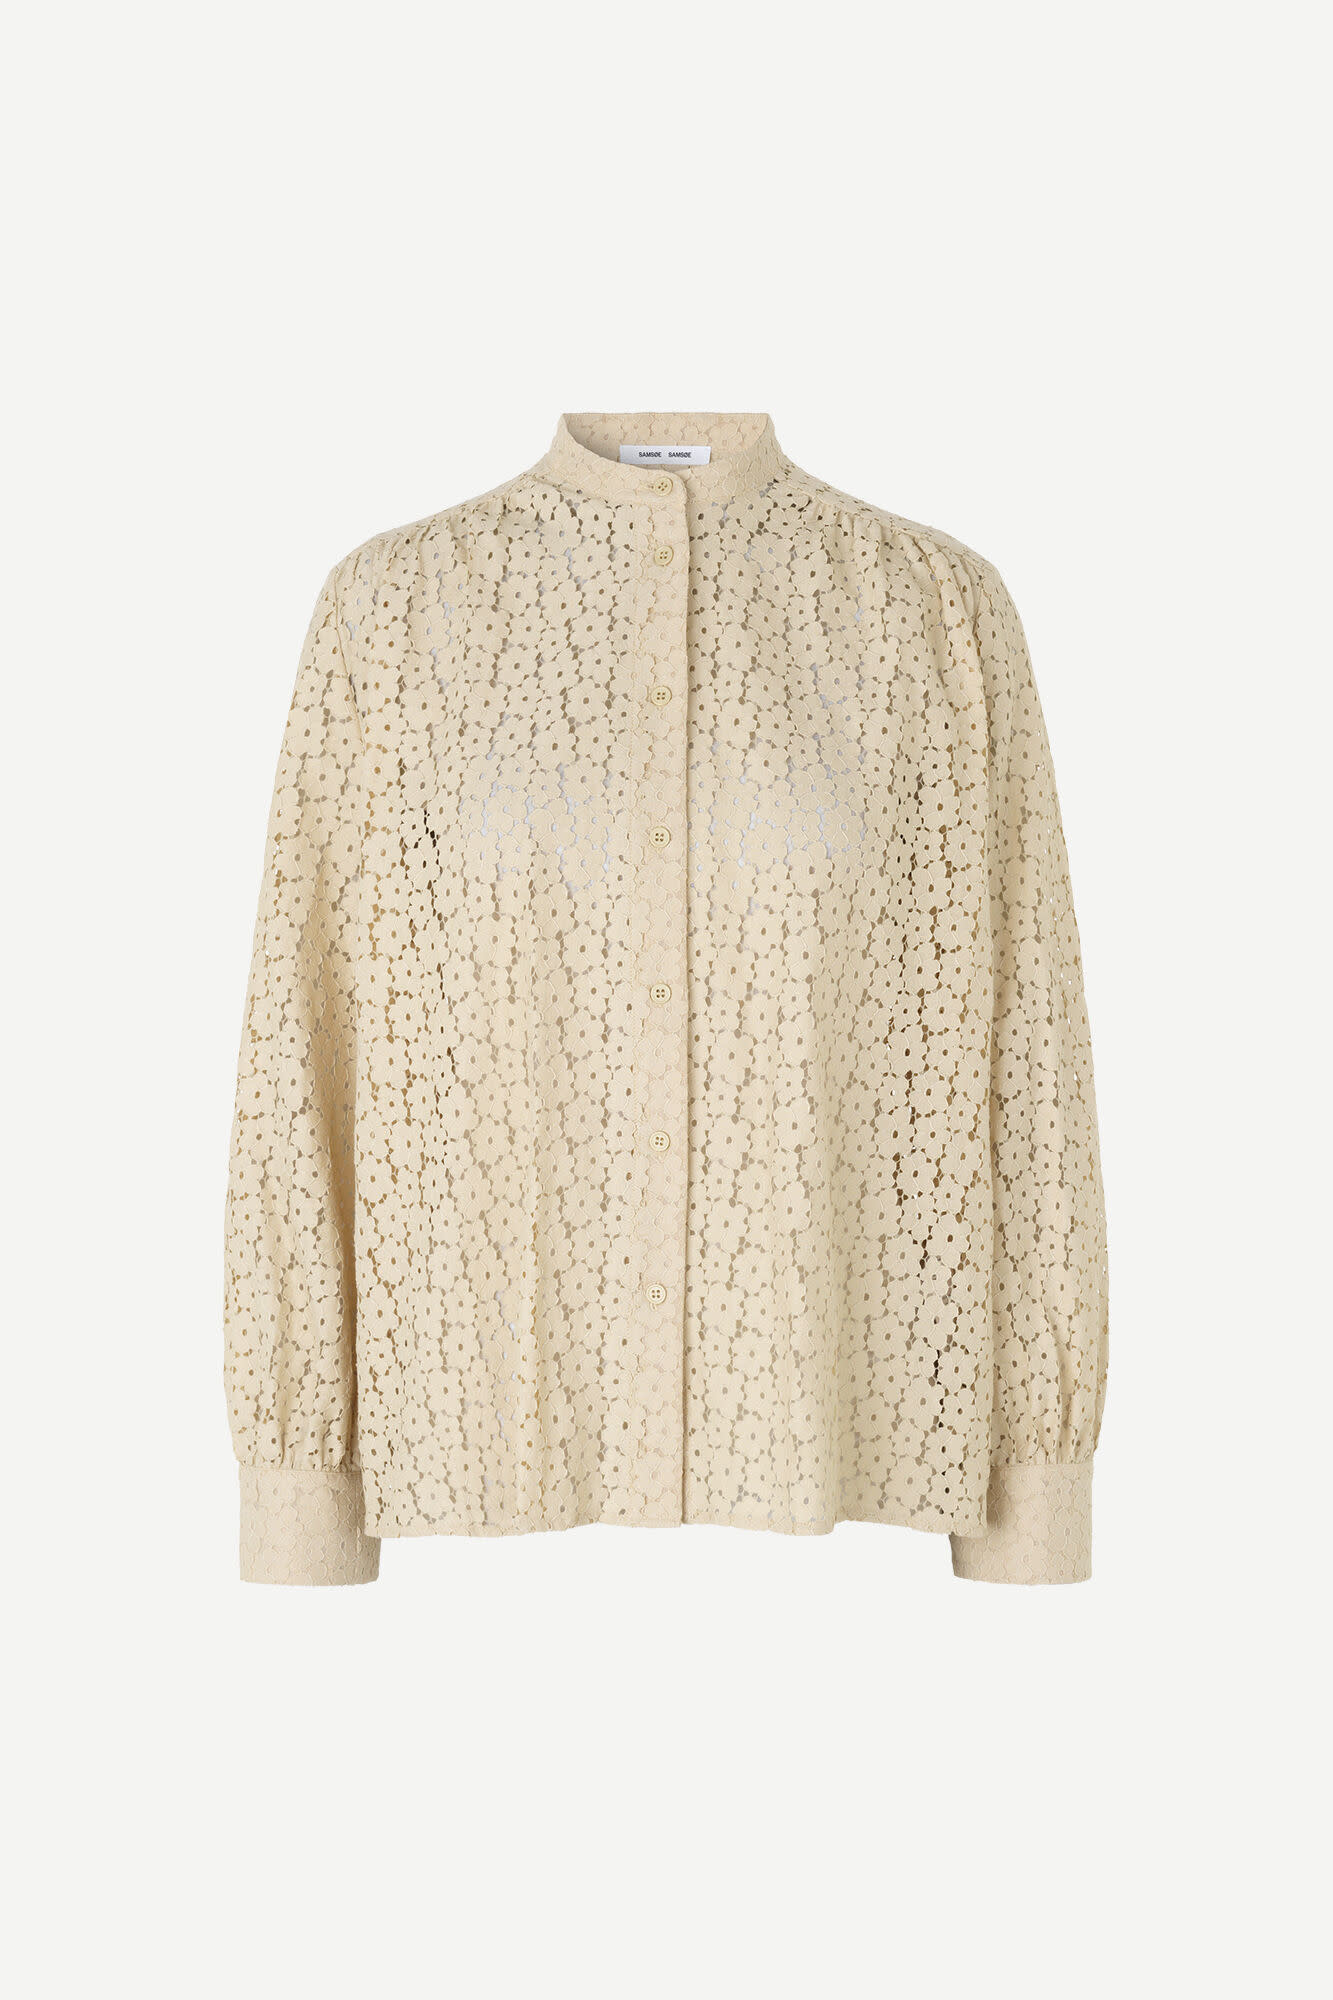 Kiana Brown Rice Embroidery Blouse-1